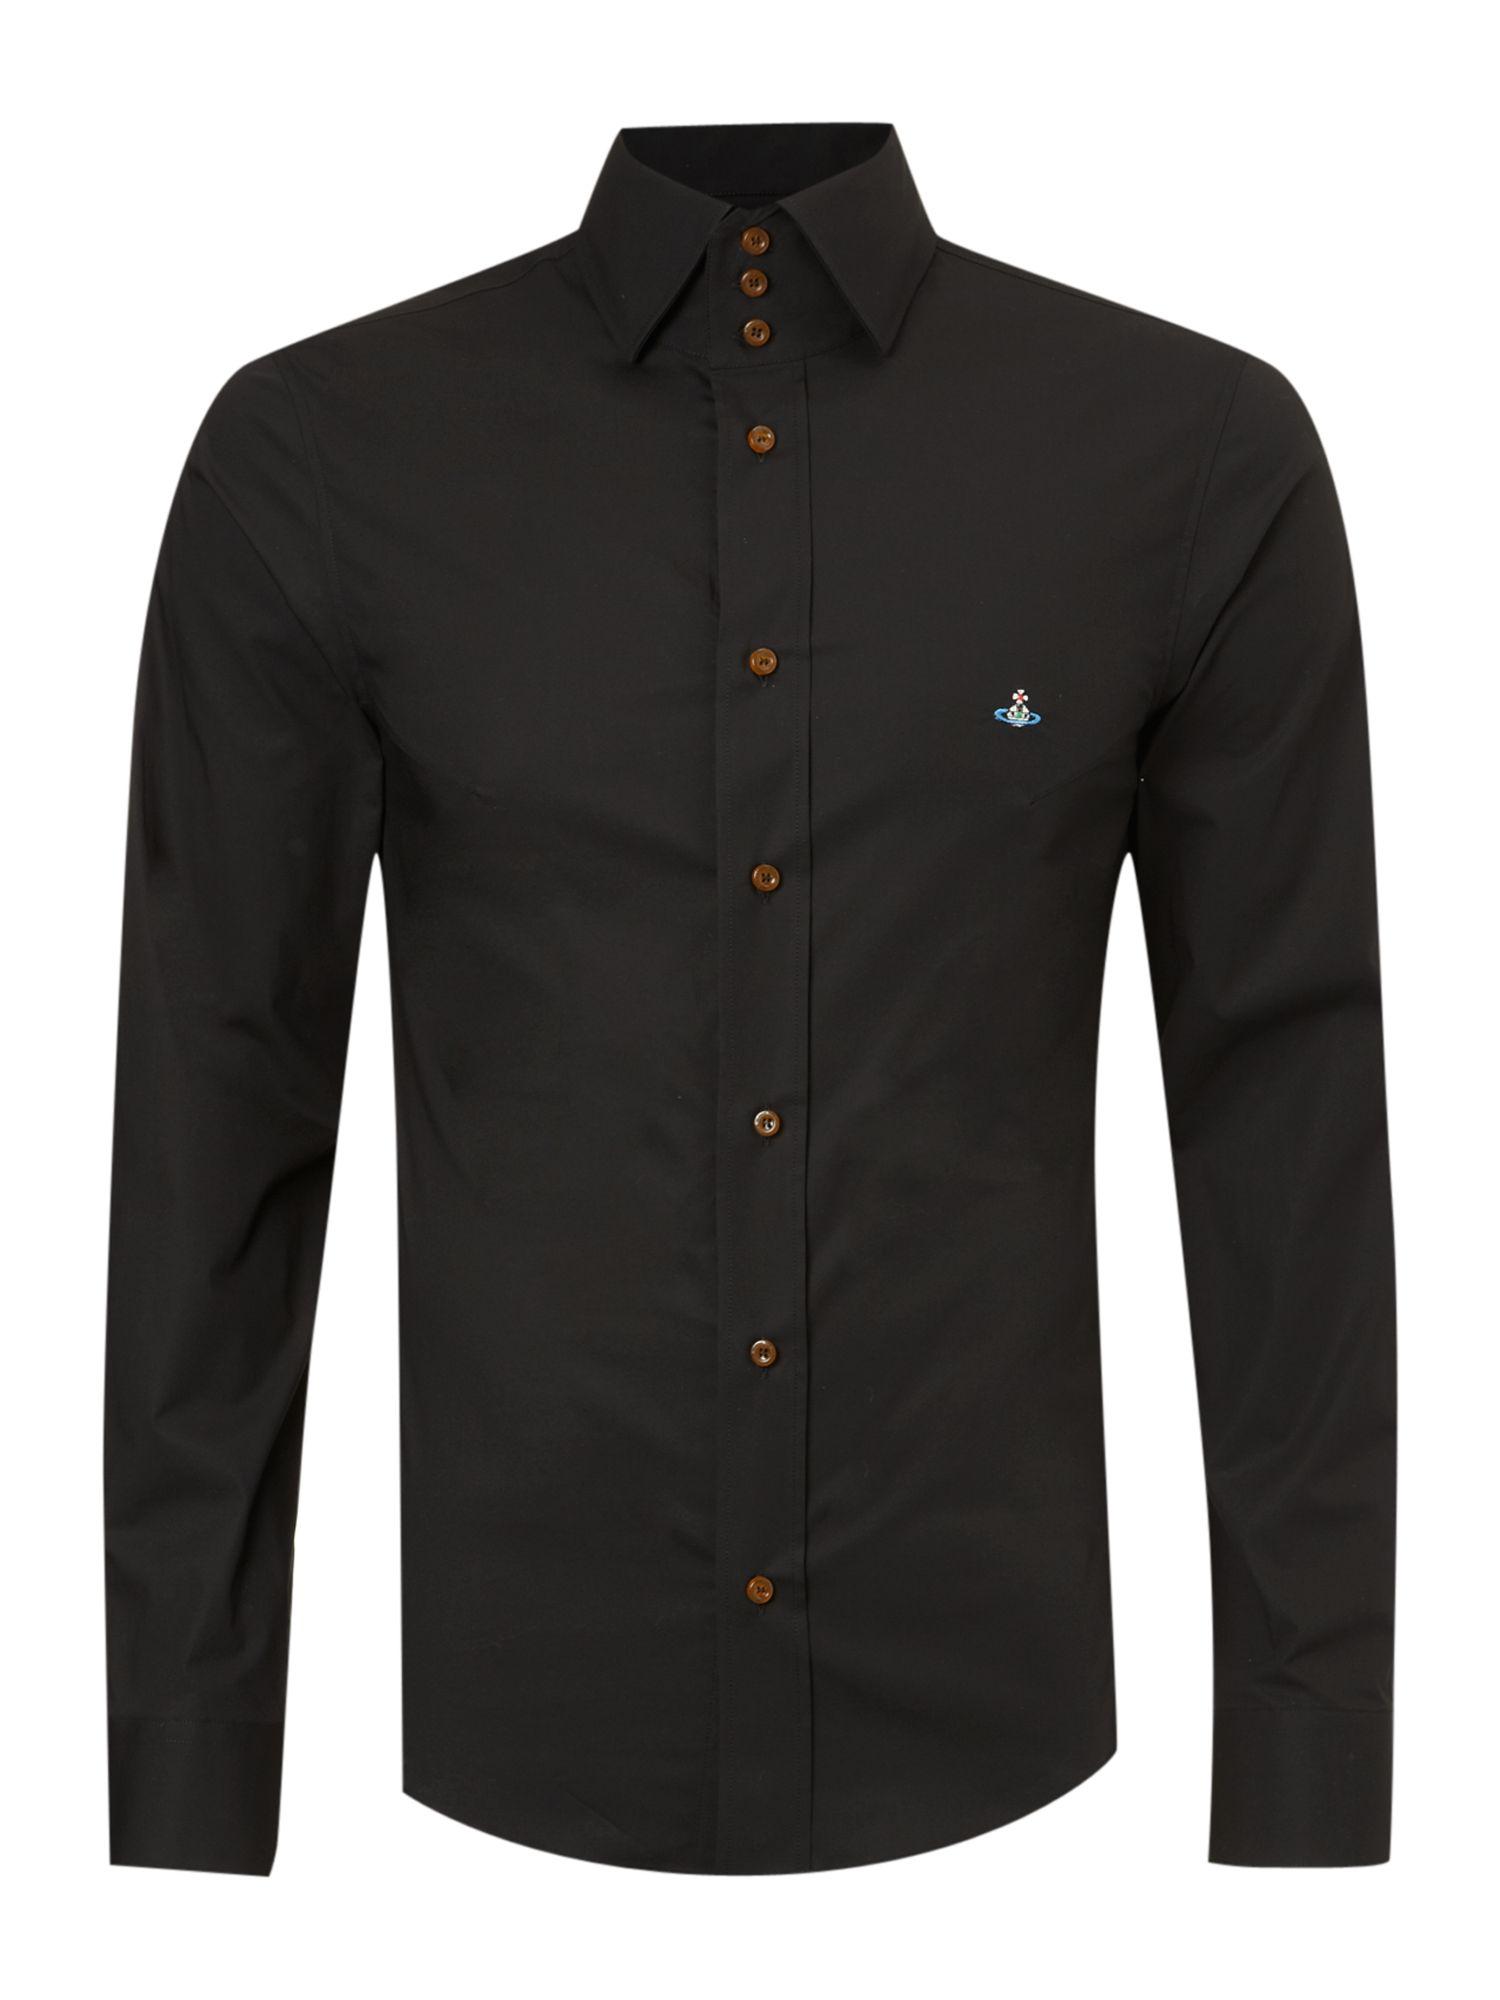 Vivienne Westwood Button Down Shirt In Black For Men Lyst